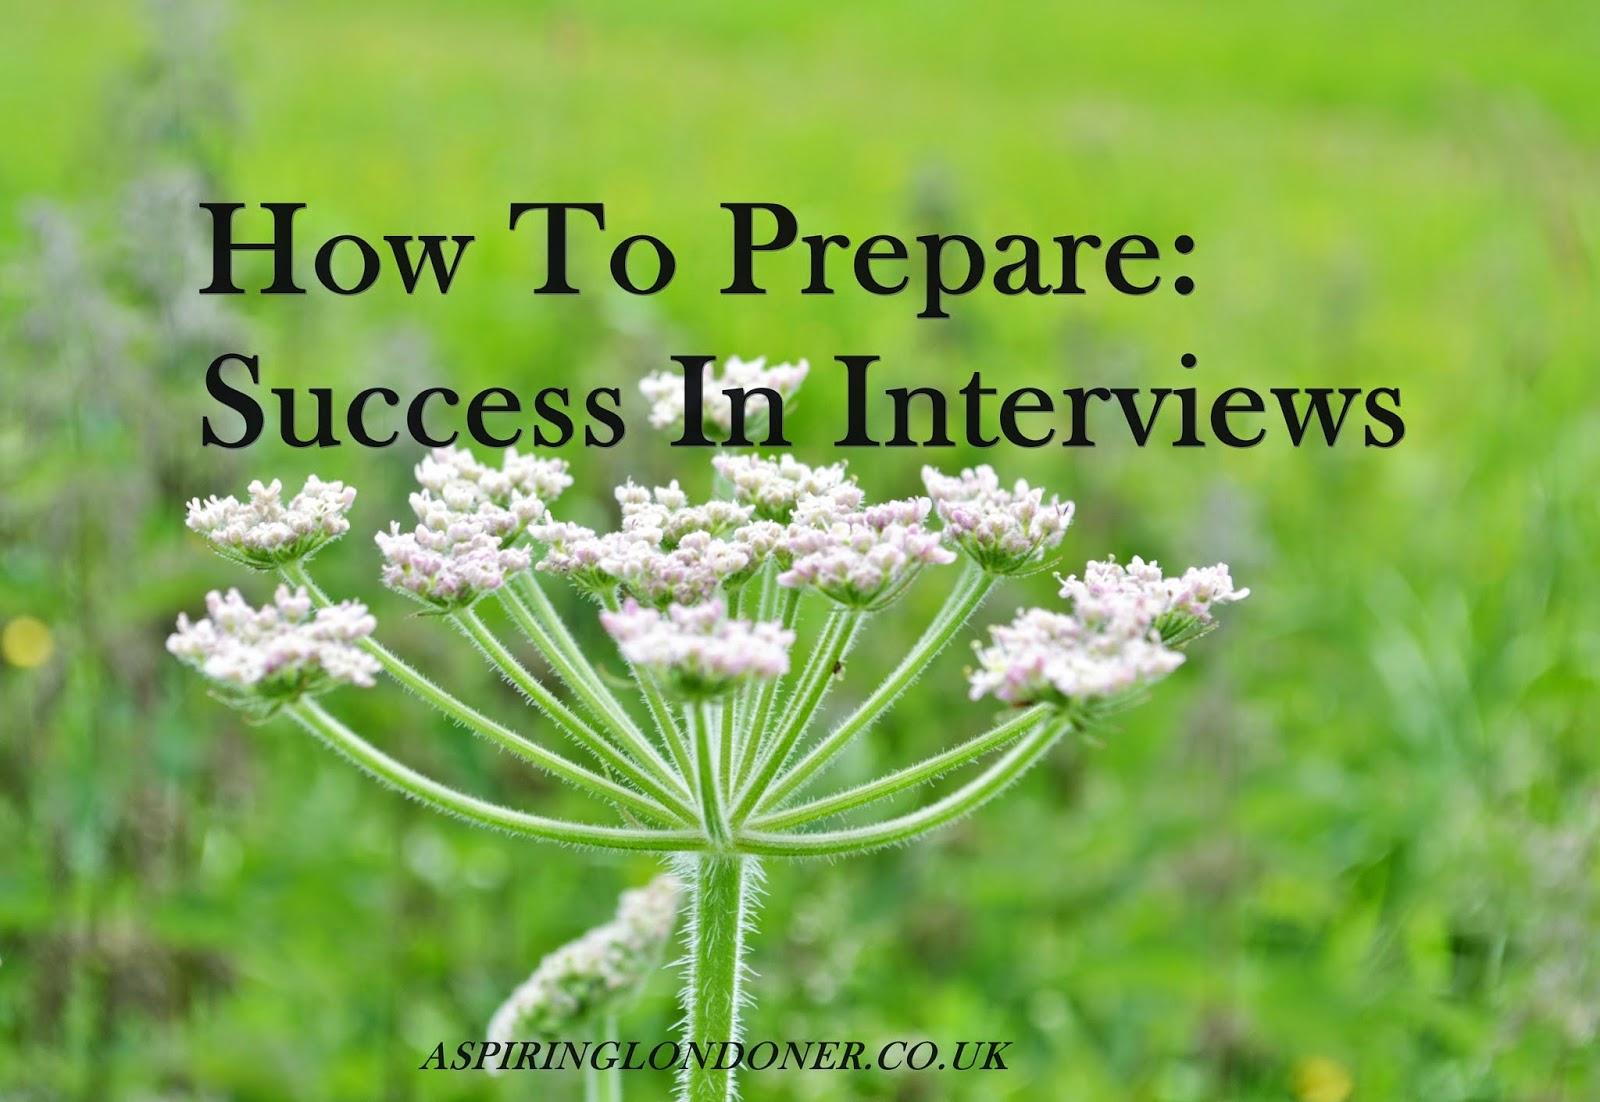 Prepare for a successful interview - Aspiring Londoner